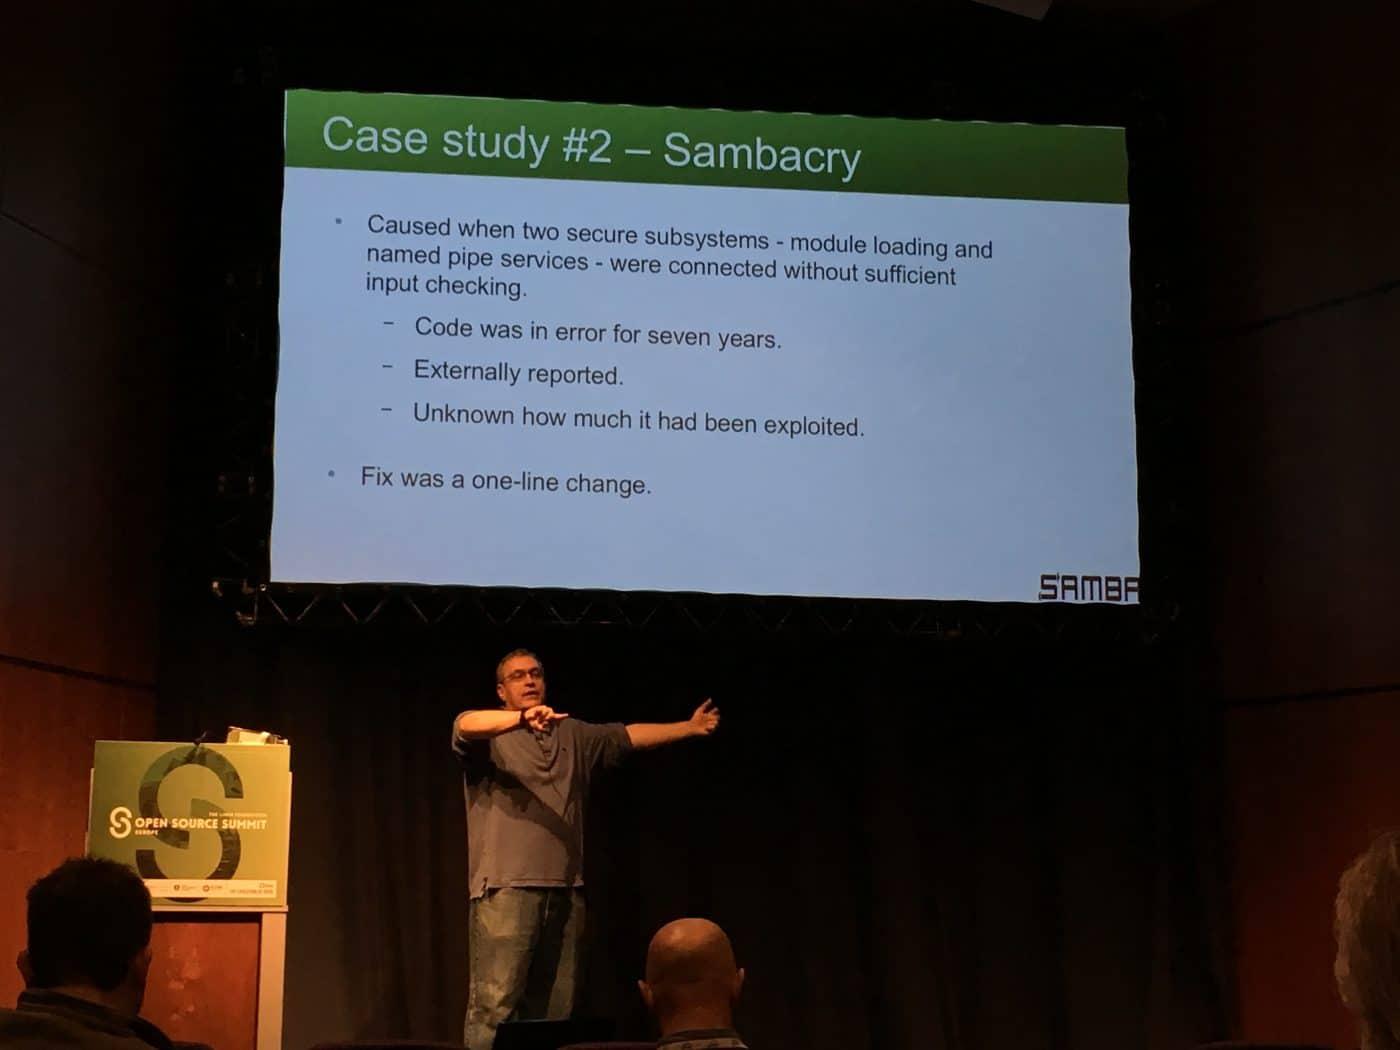 Jeremy Allison talking about the Sambacry vulnerability